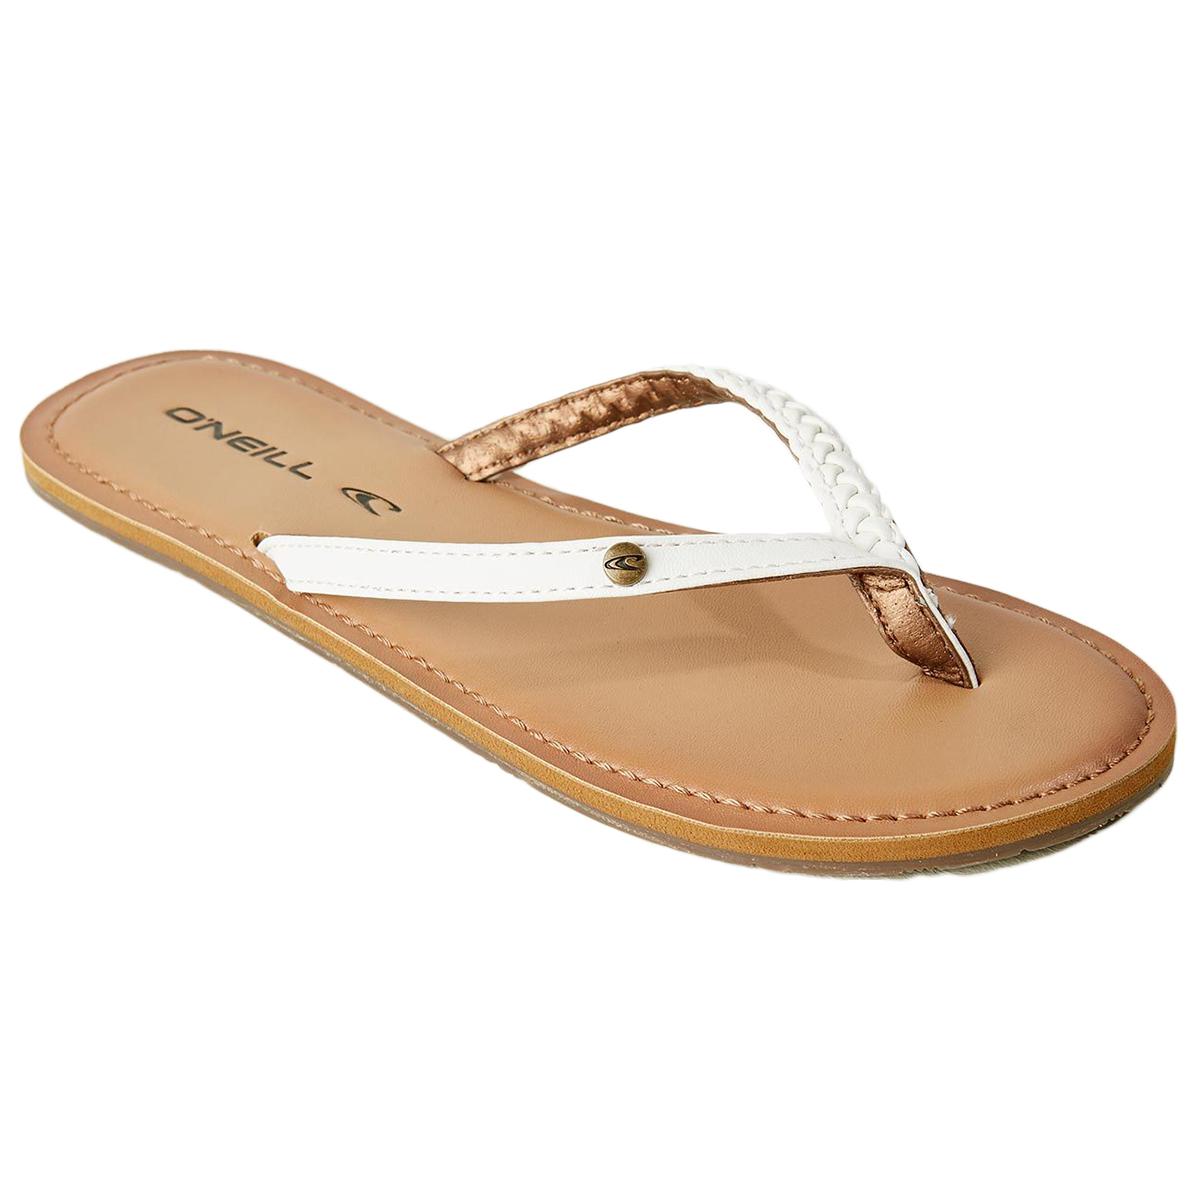 O'neill Women's Malibu Thong Sandal - White, 8